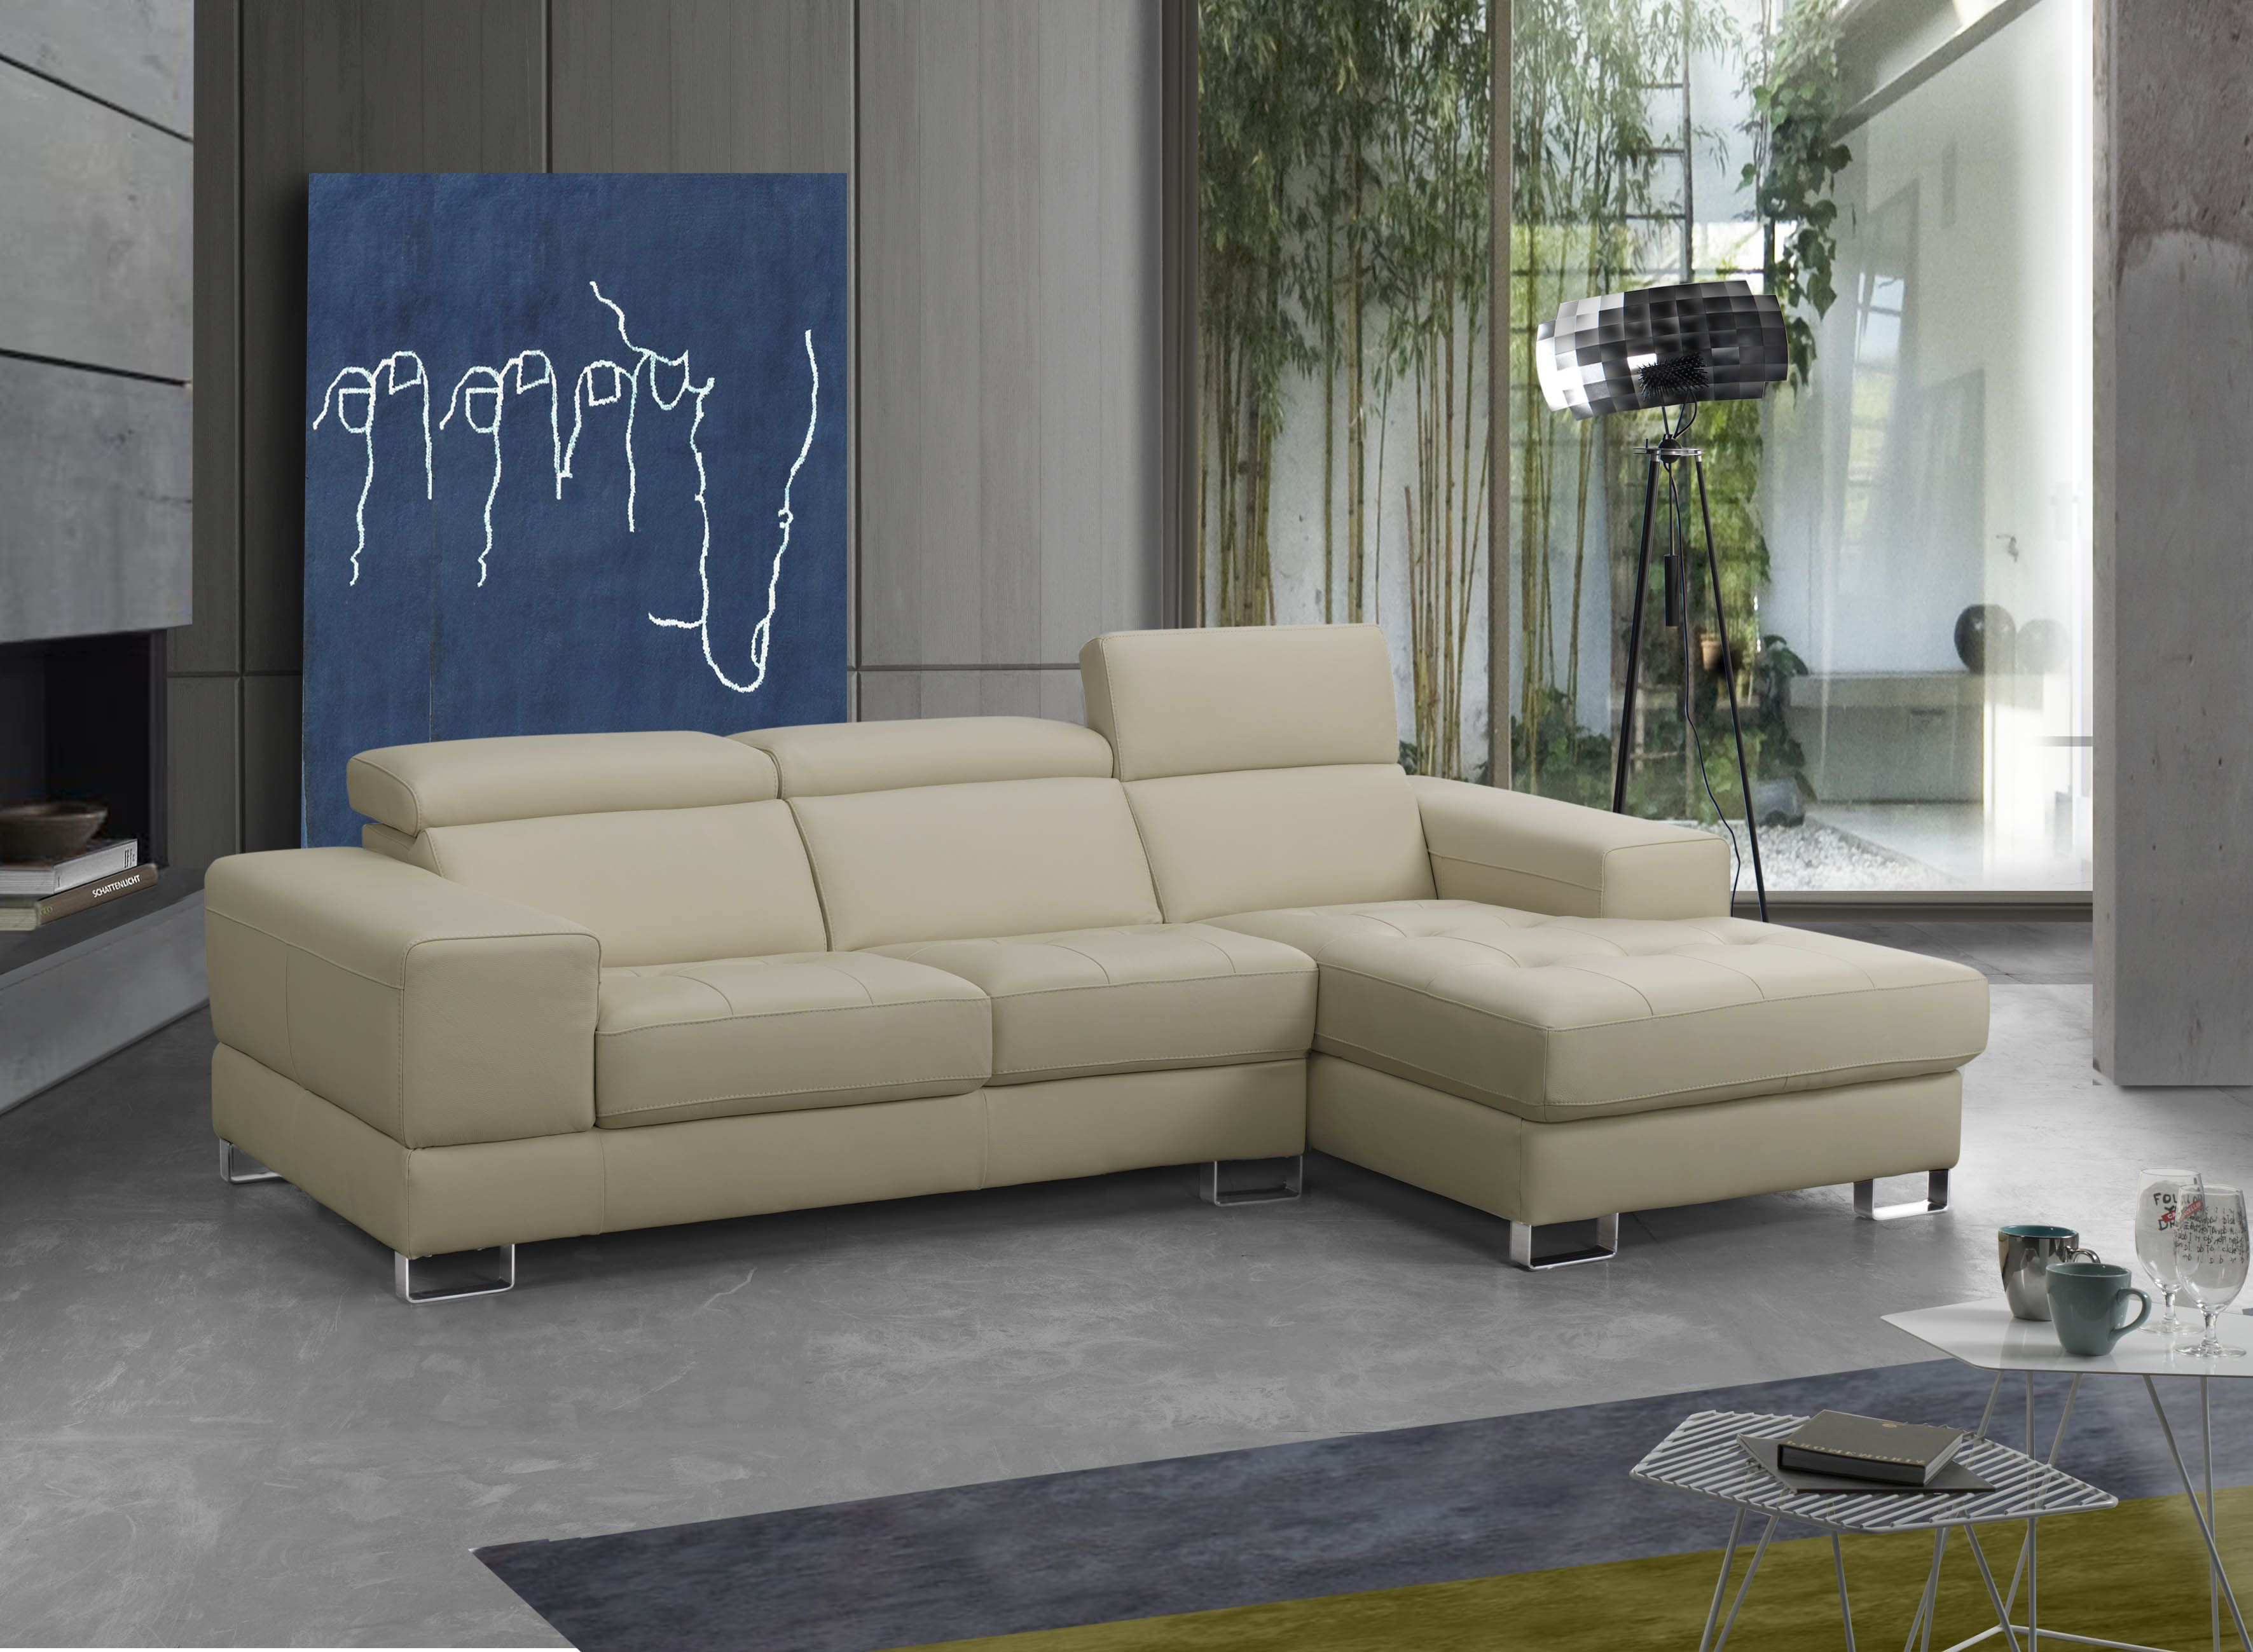 Wondrous Advanced Adjustable Furniture Italian Leather Upholstery In Creativecarmelina Interior Chair Design Creativecarmelinacom